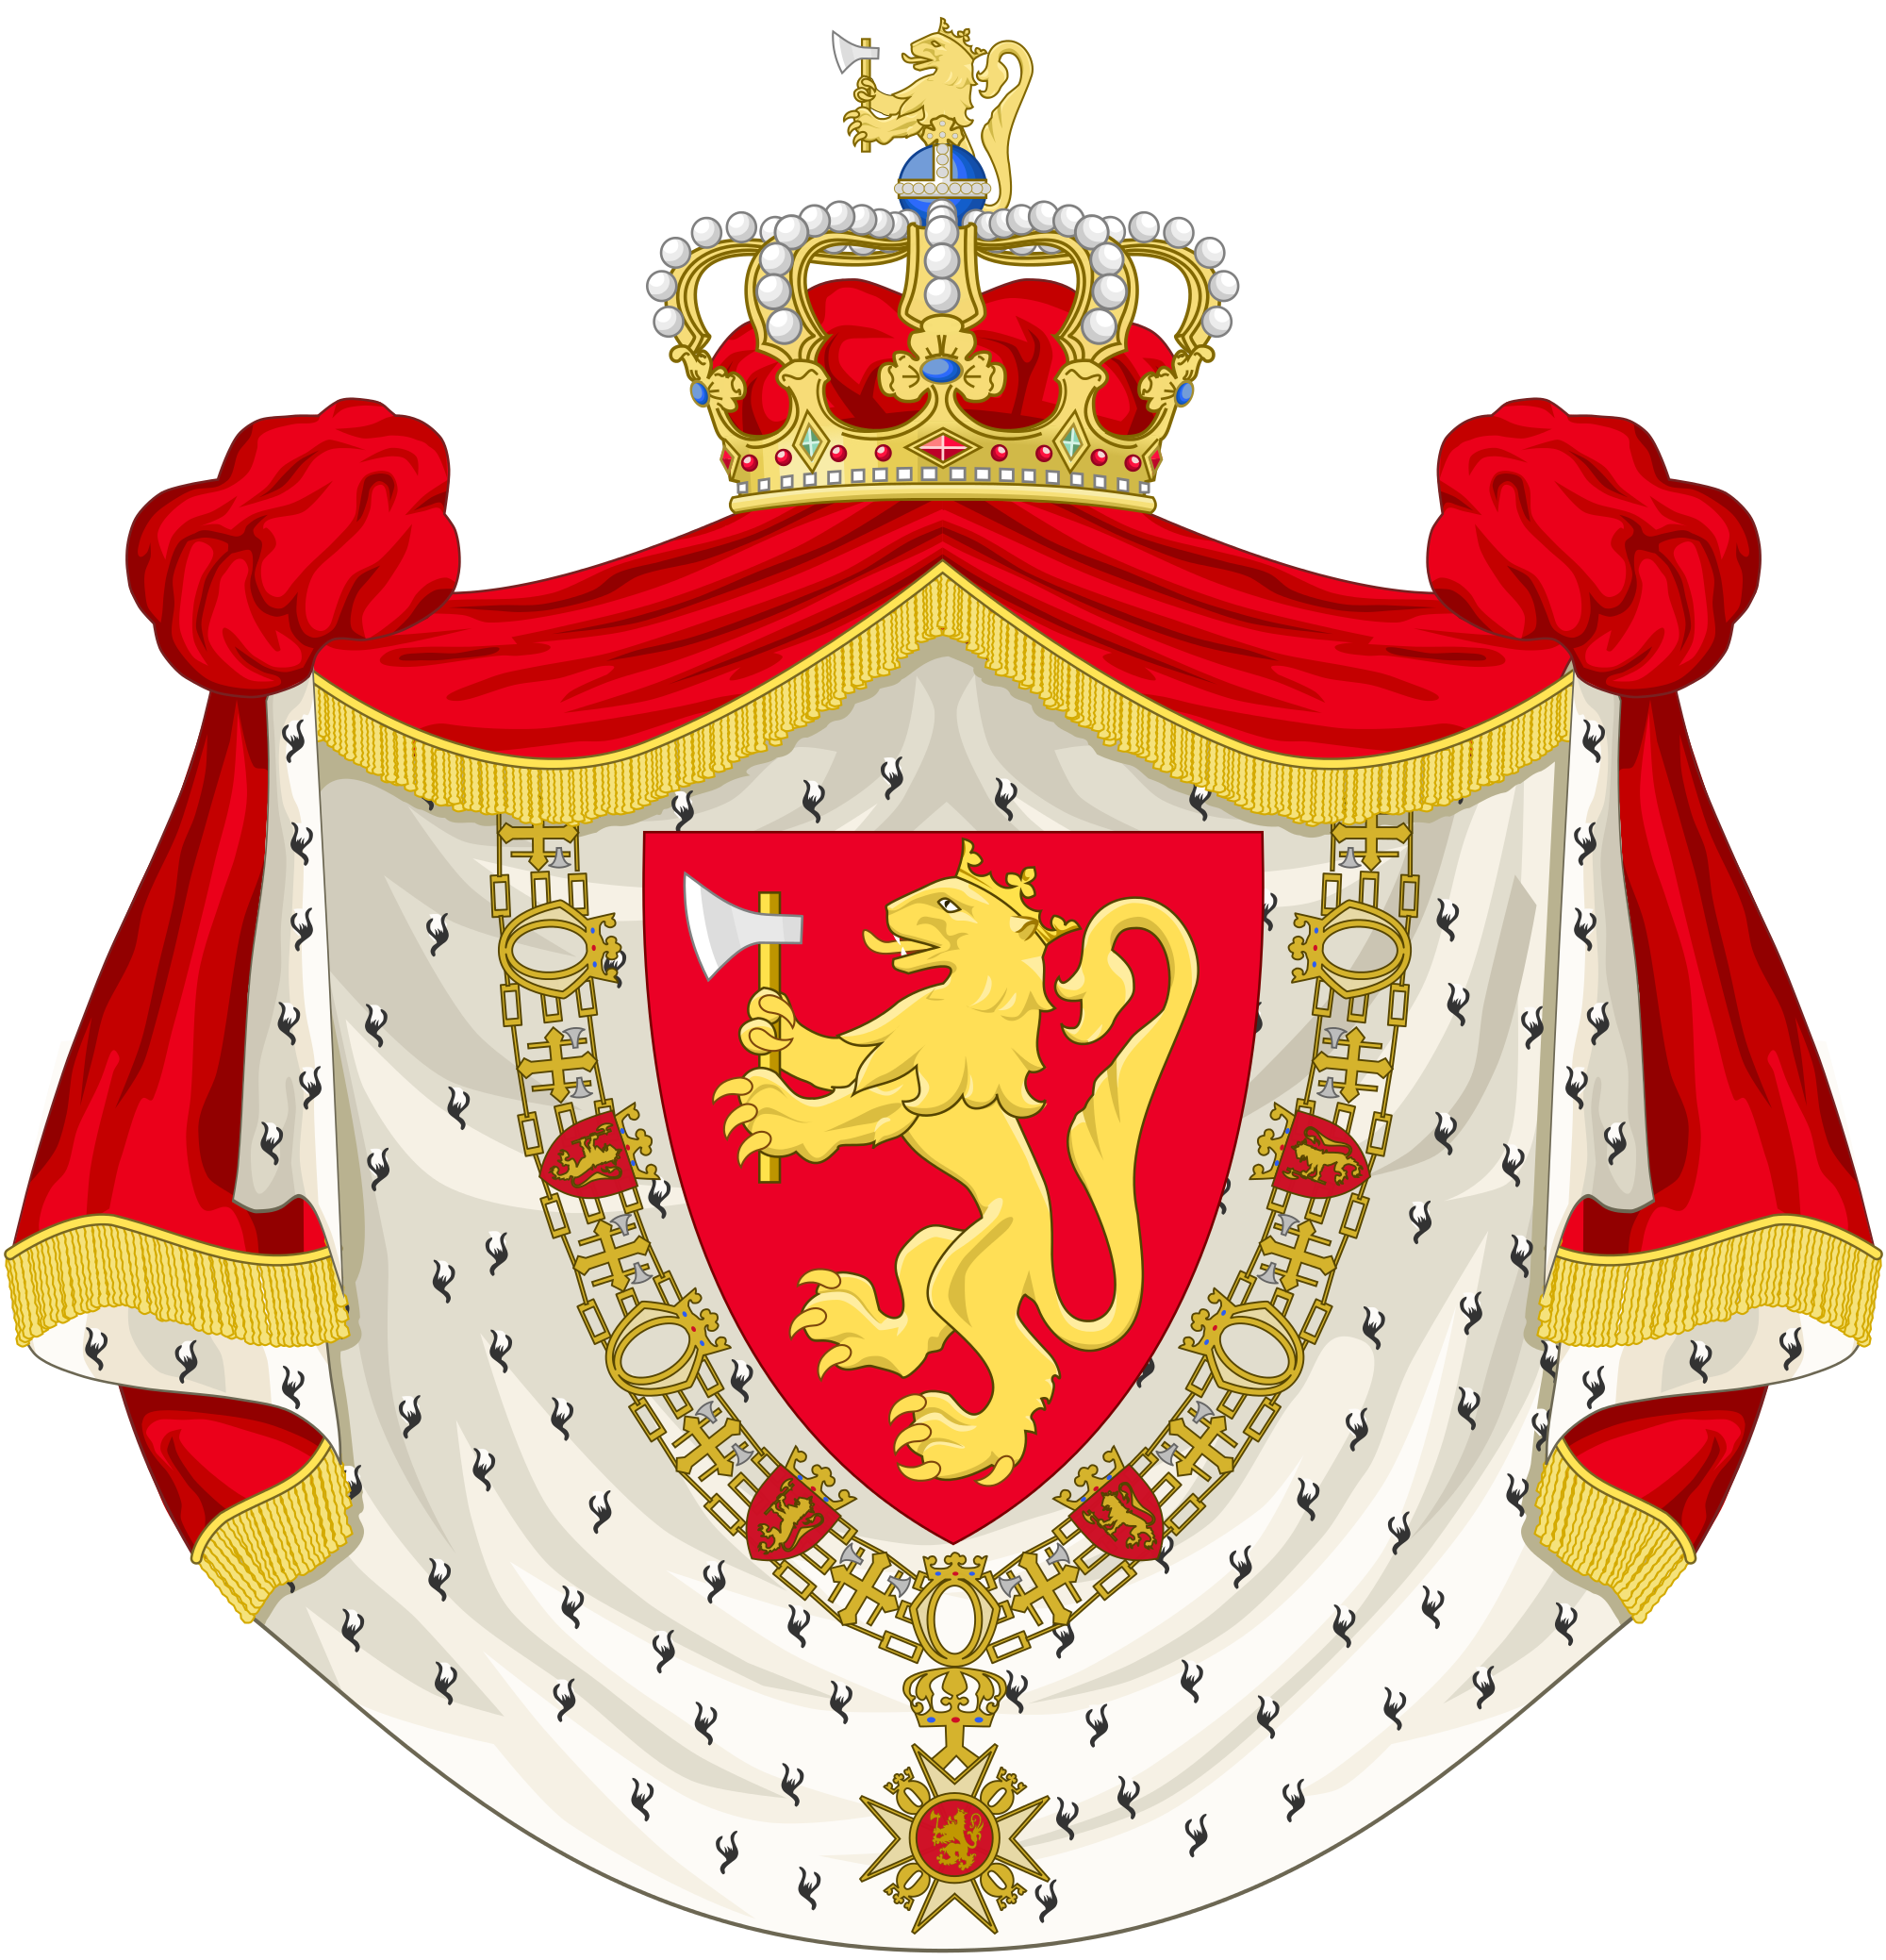 Coat of arms norway google haku armorial pinterest coat of arms norway google haku biocorpaavc Image collections